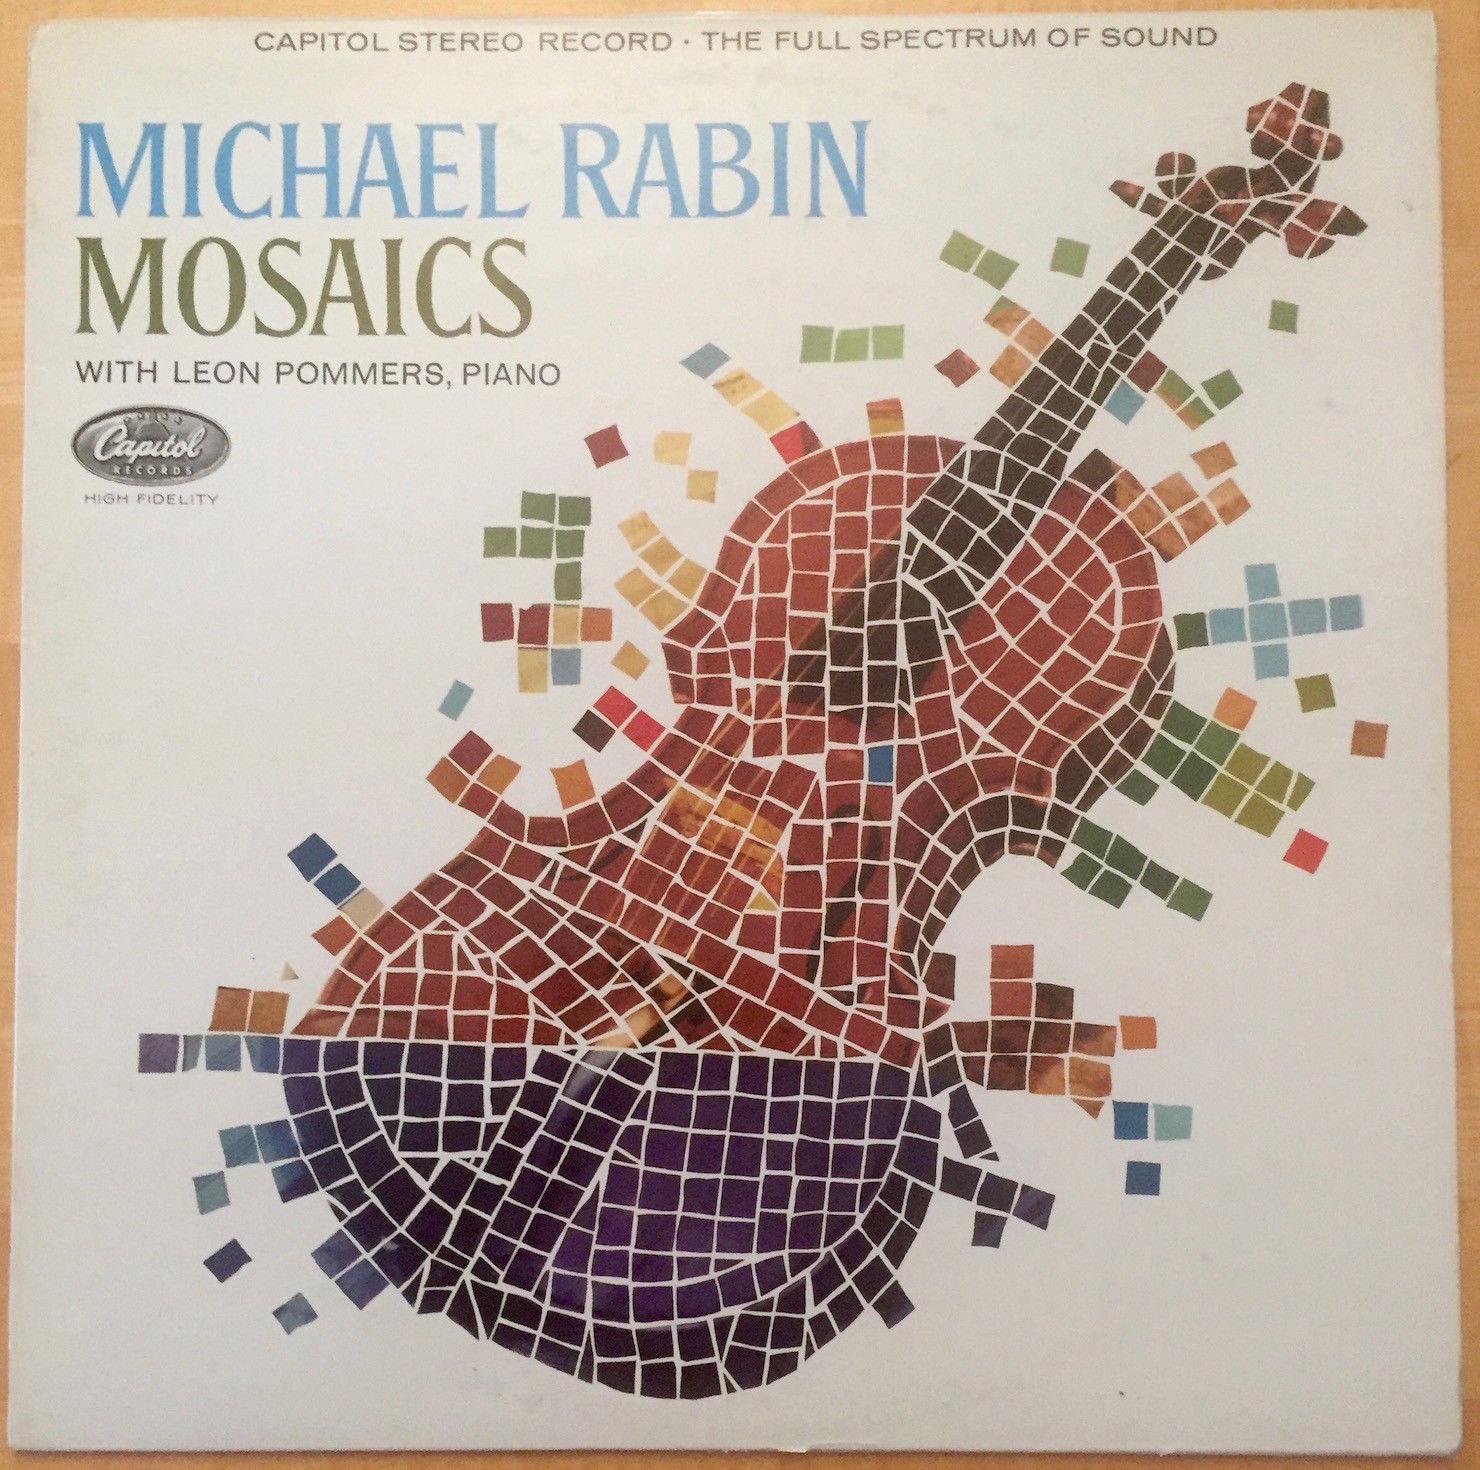 Michael Rabin - Mosaics - Capitol UK SP 8506 - near mint